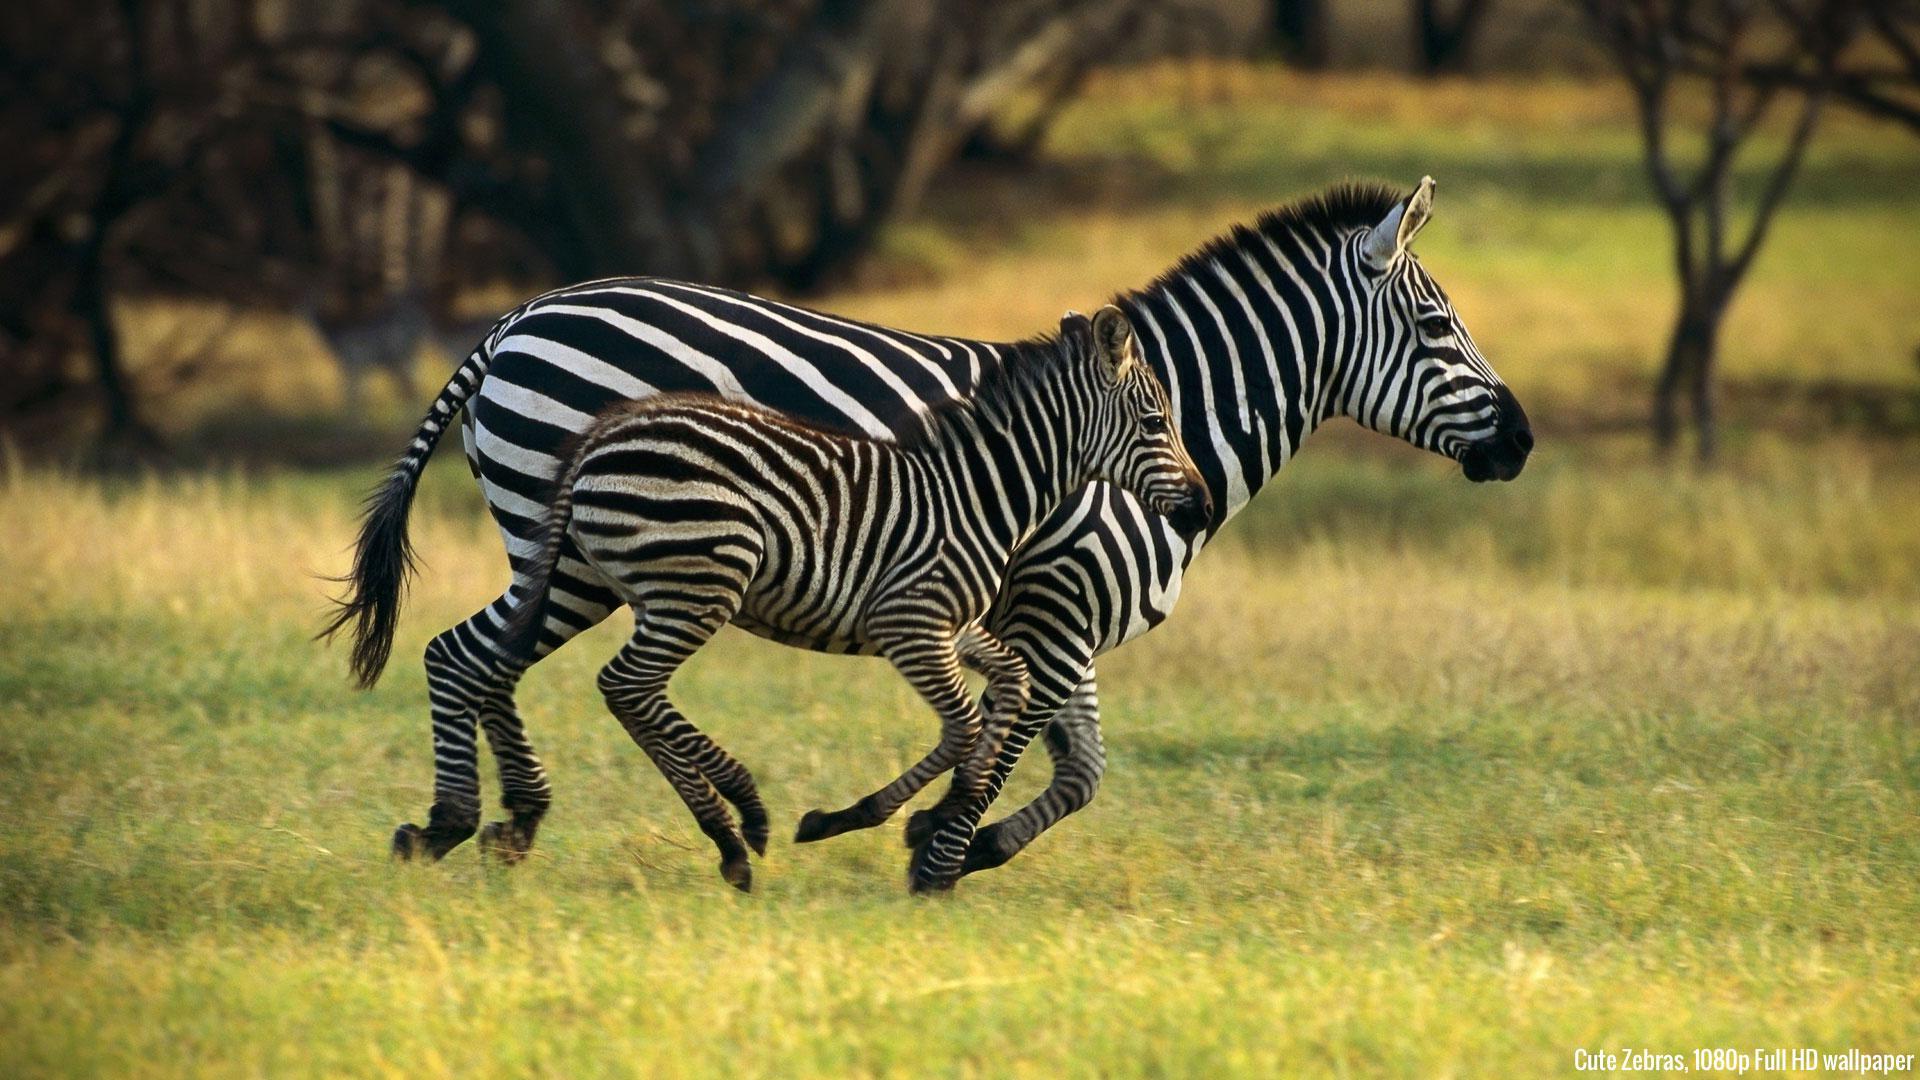 beautiful-and-cute-animals-wallpaper-wp3402978